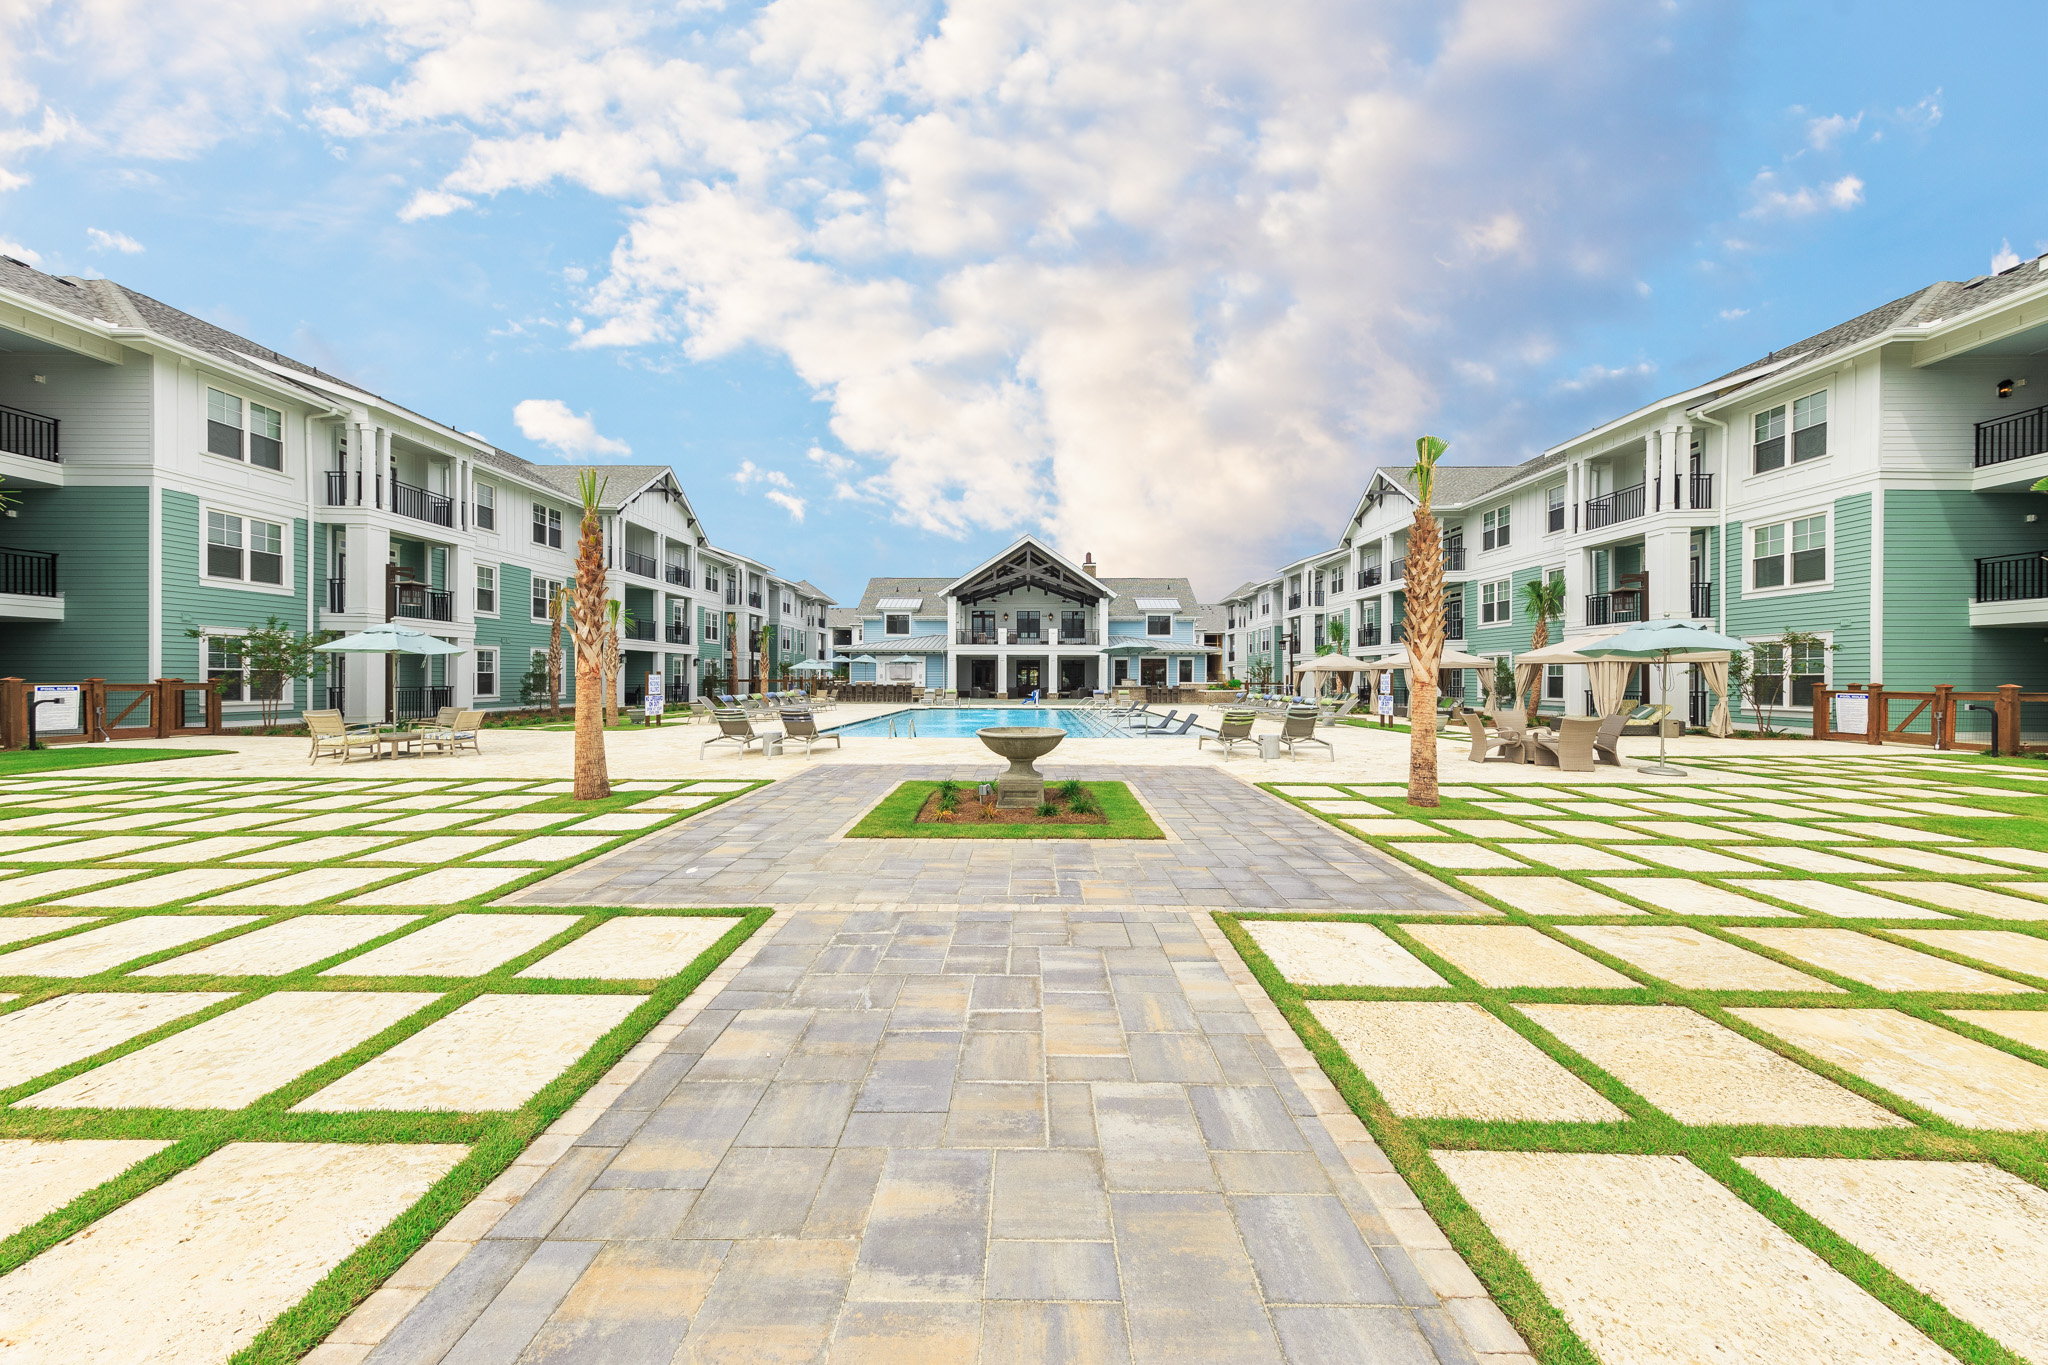 Wharf 7 apartments outside of Charleston, SC